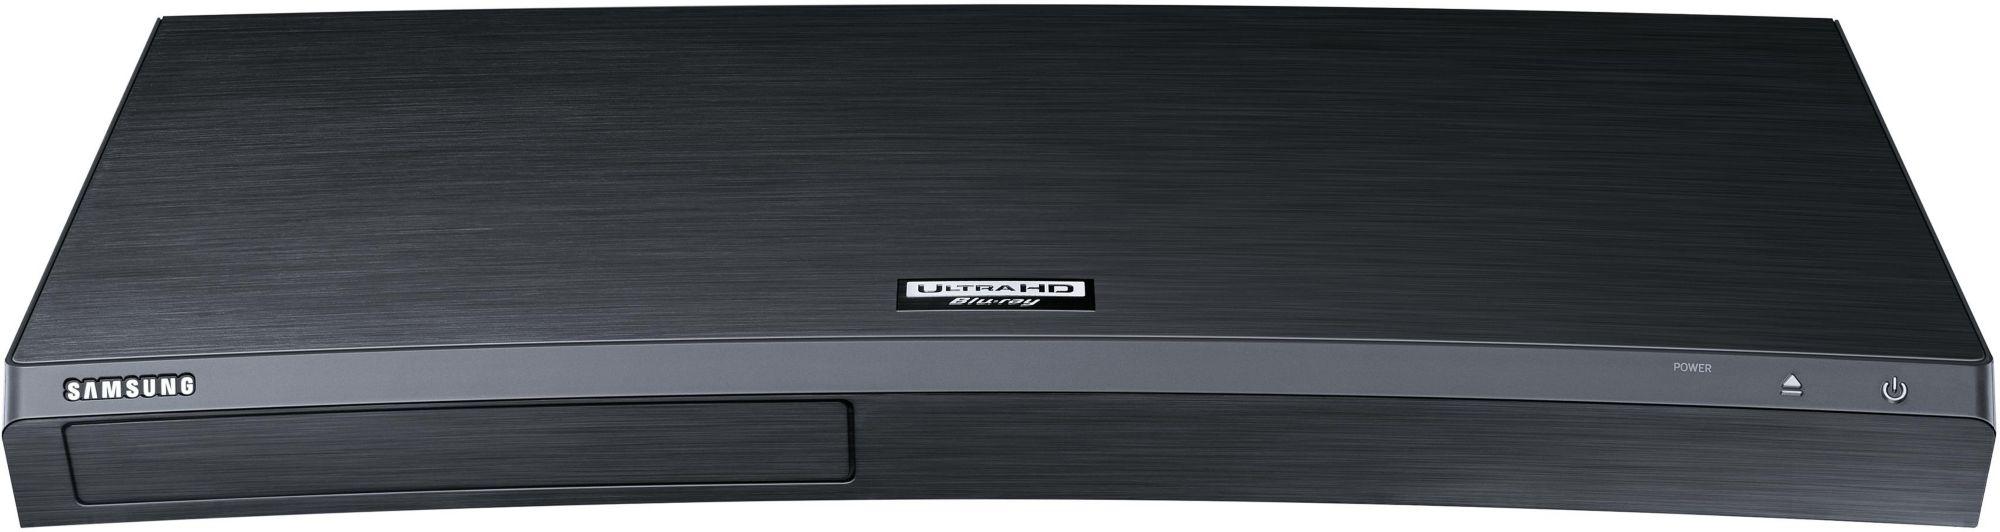 SAMSUNG Samsung UBD-9500/EN Ultra-HD Blu Ray Player (Bluetooth, WLAN)